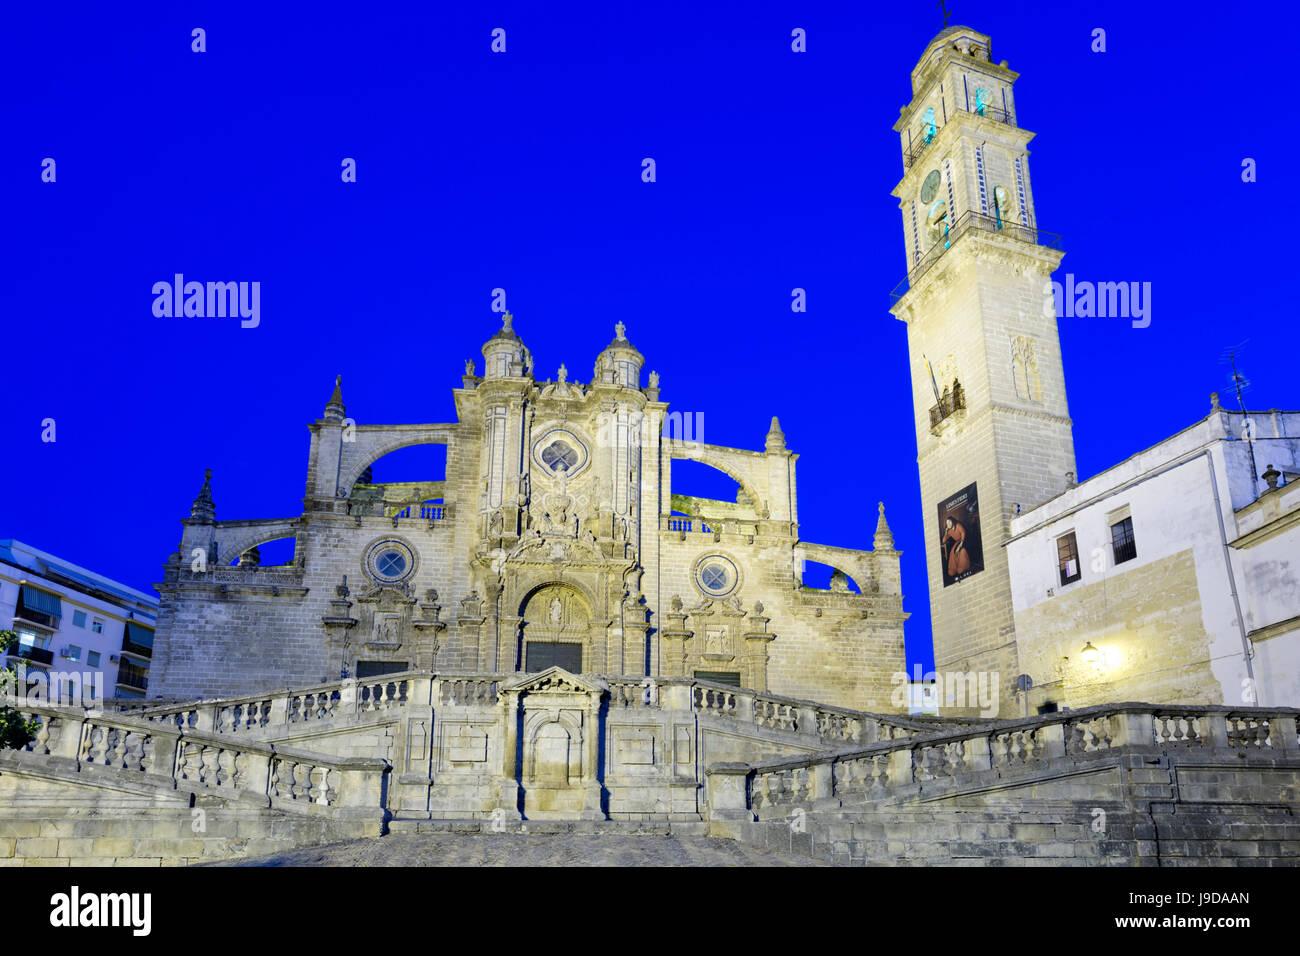 Jerez de la Frontera Catedral de noche, Jerez de la Frontera, provincia de Cádiz, Andalucía, España, Imagen De Stock